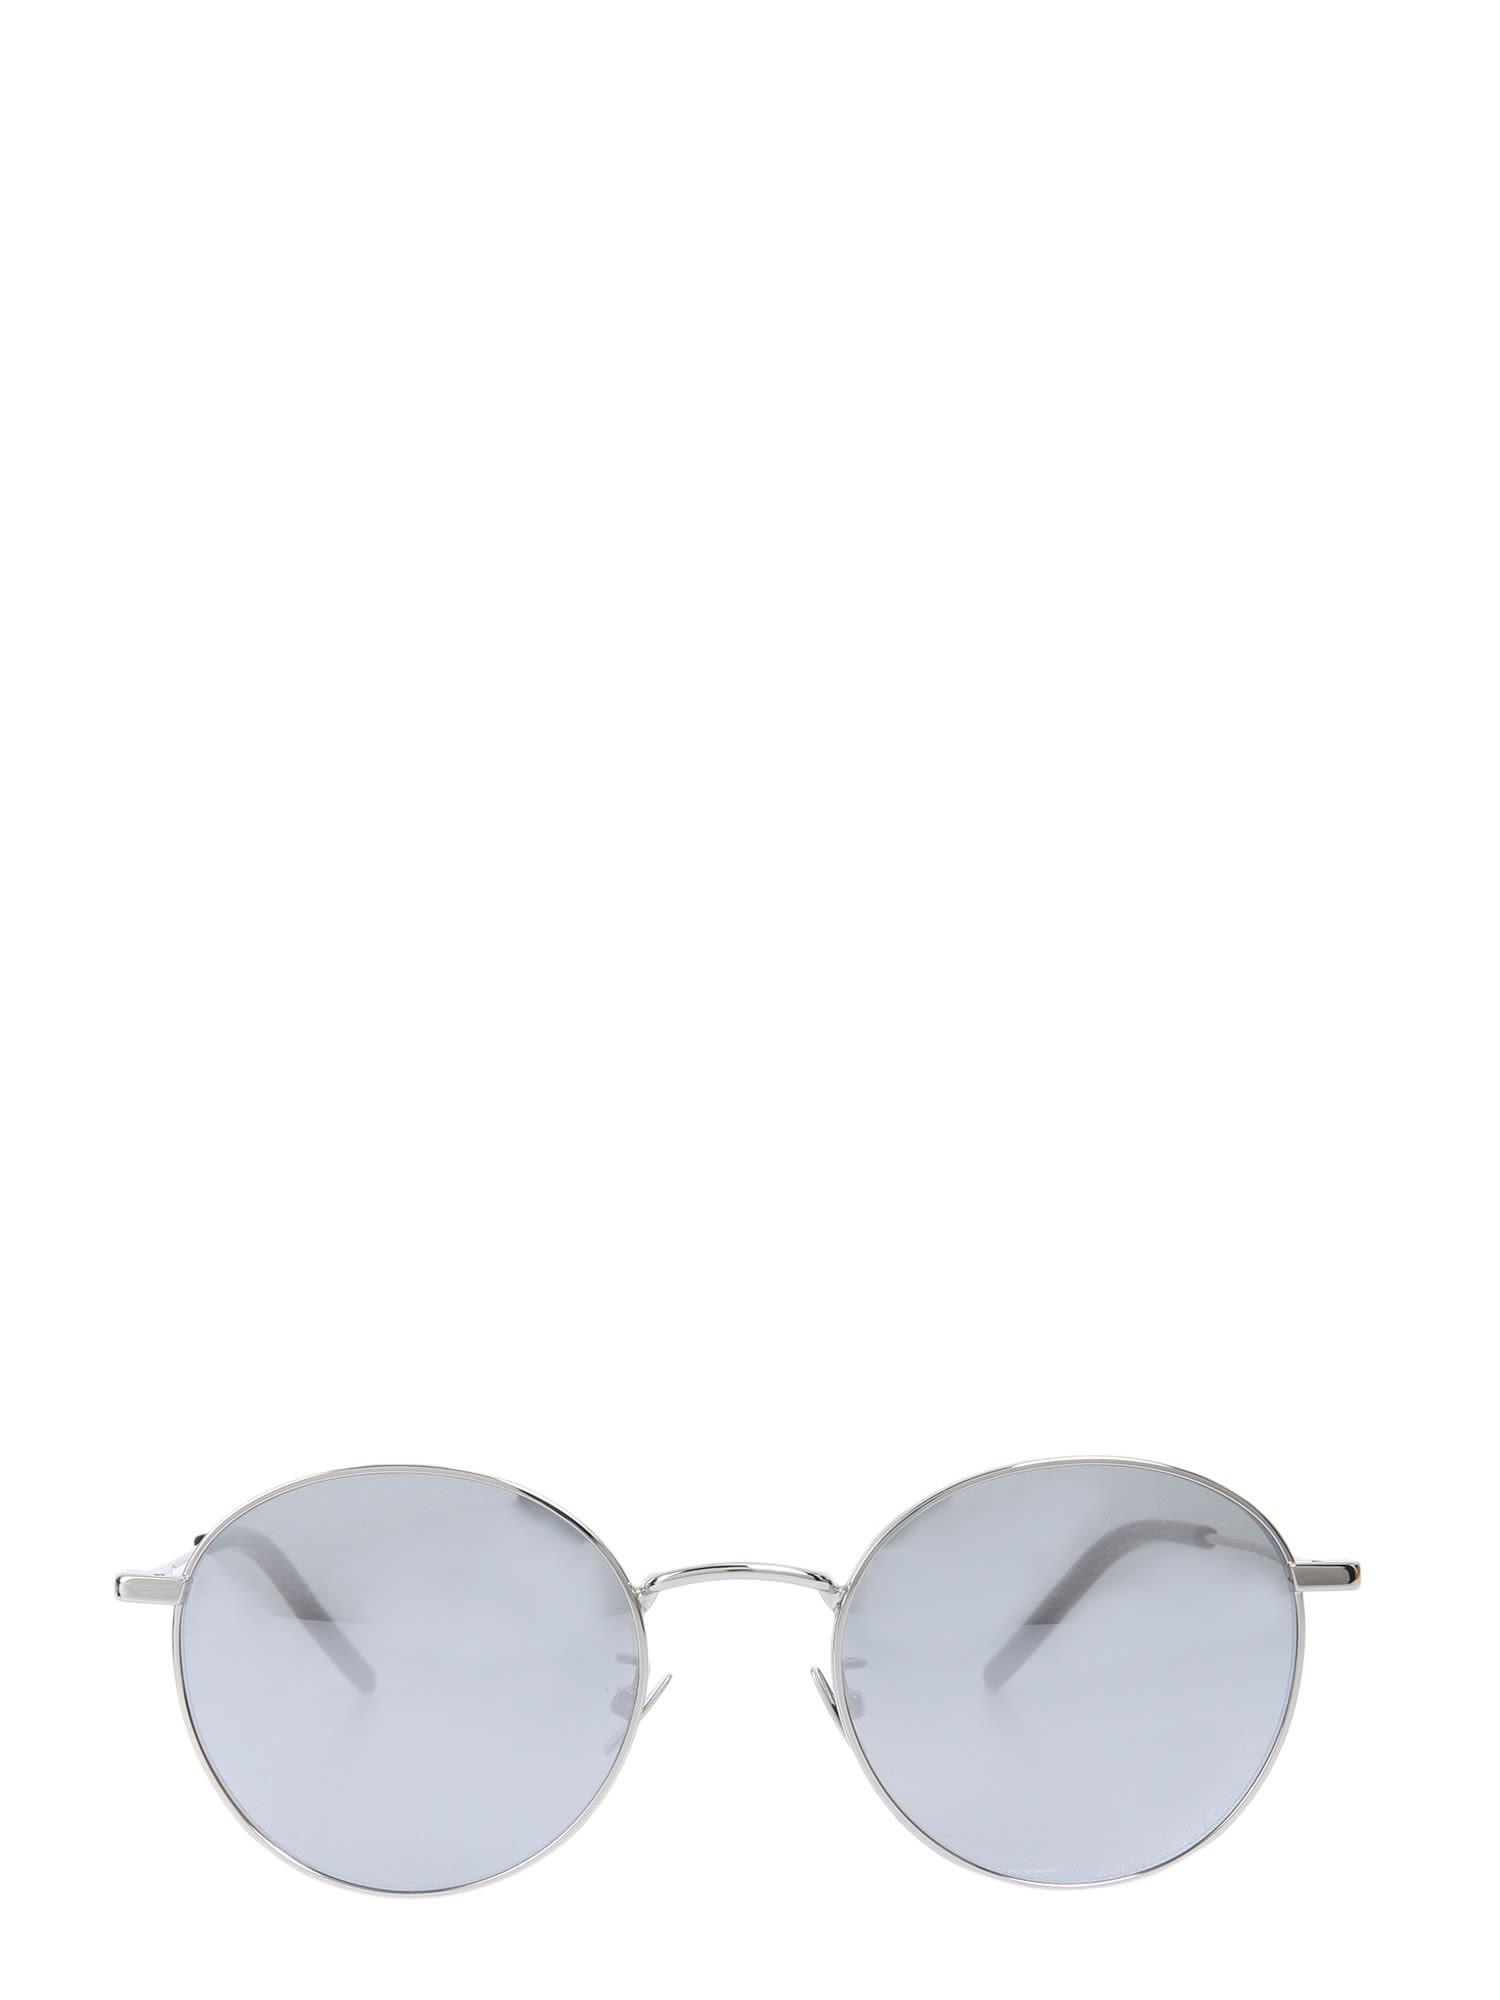 Saint Laurent Classic 250 Sunglasses